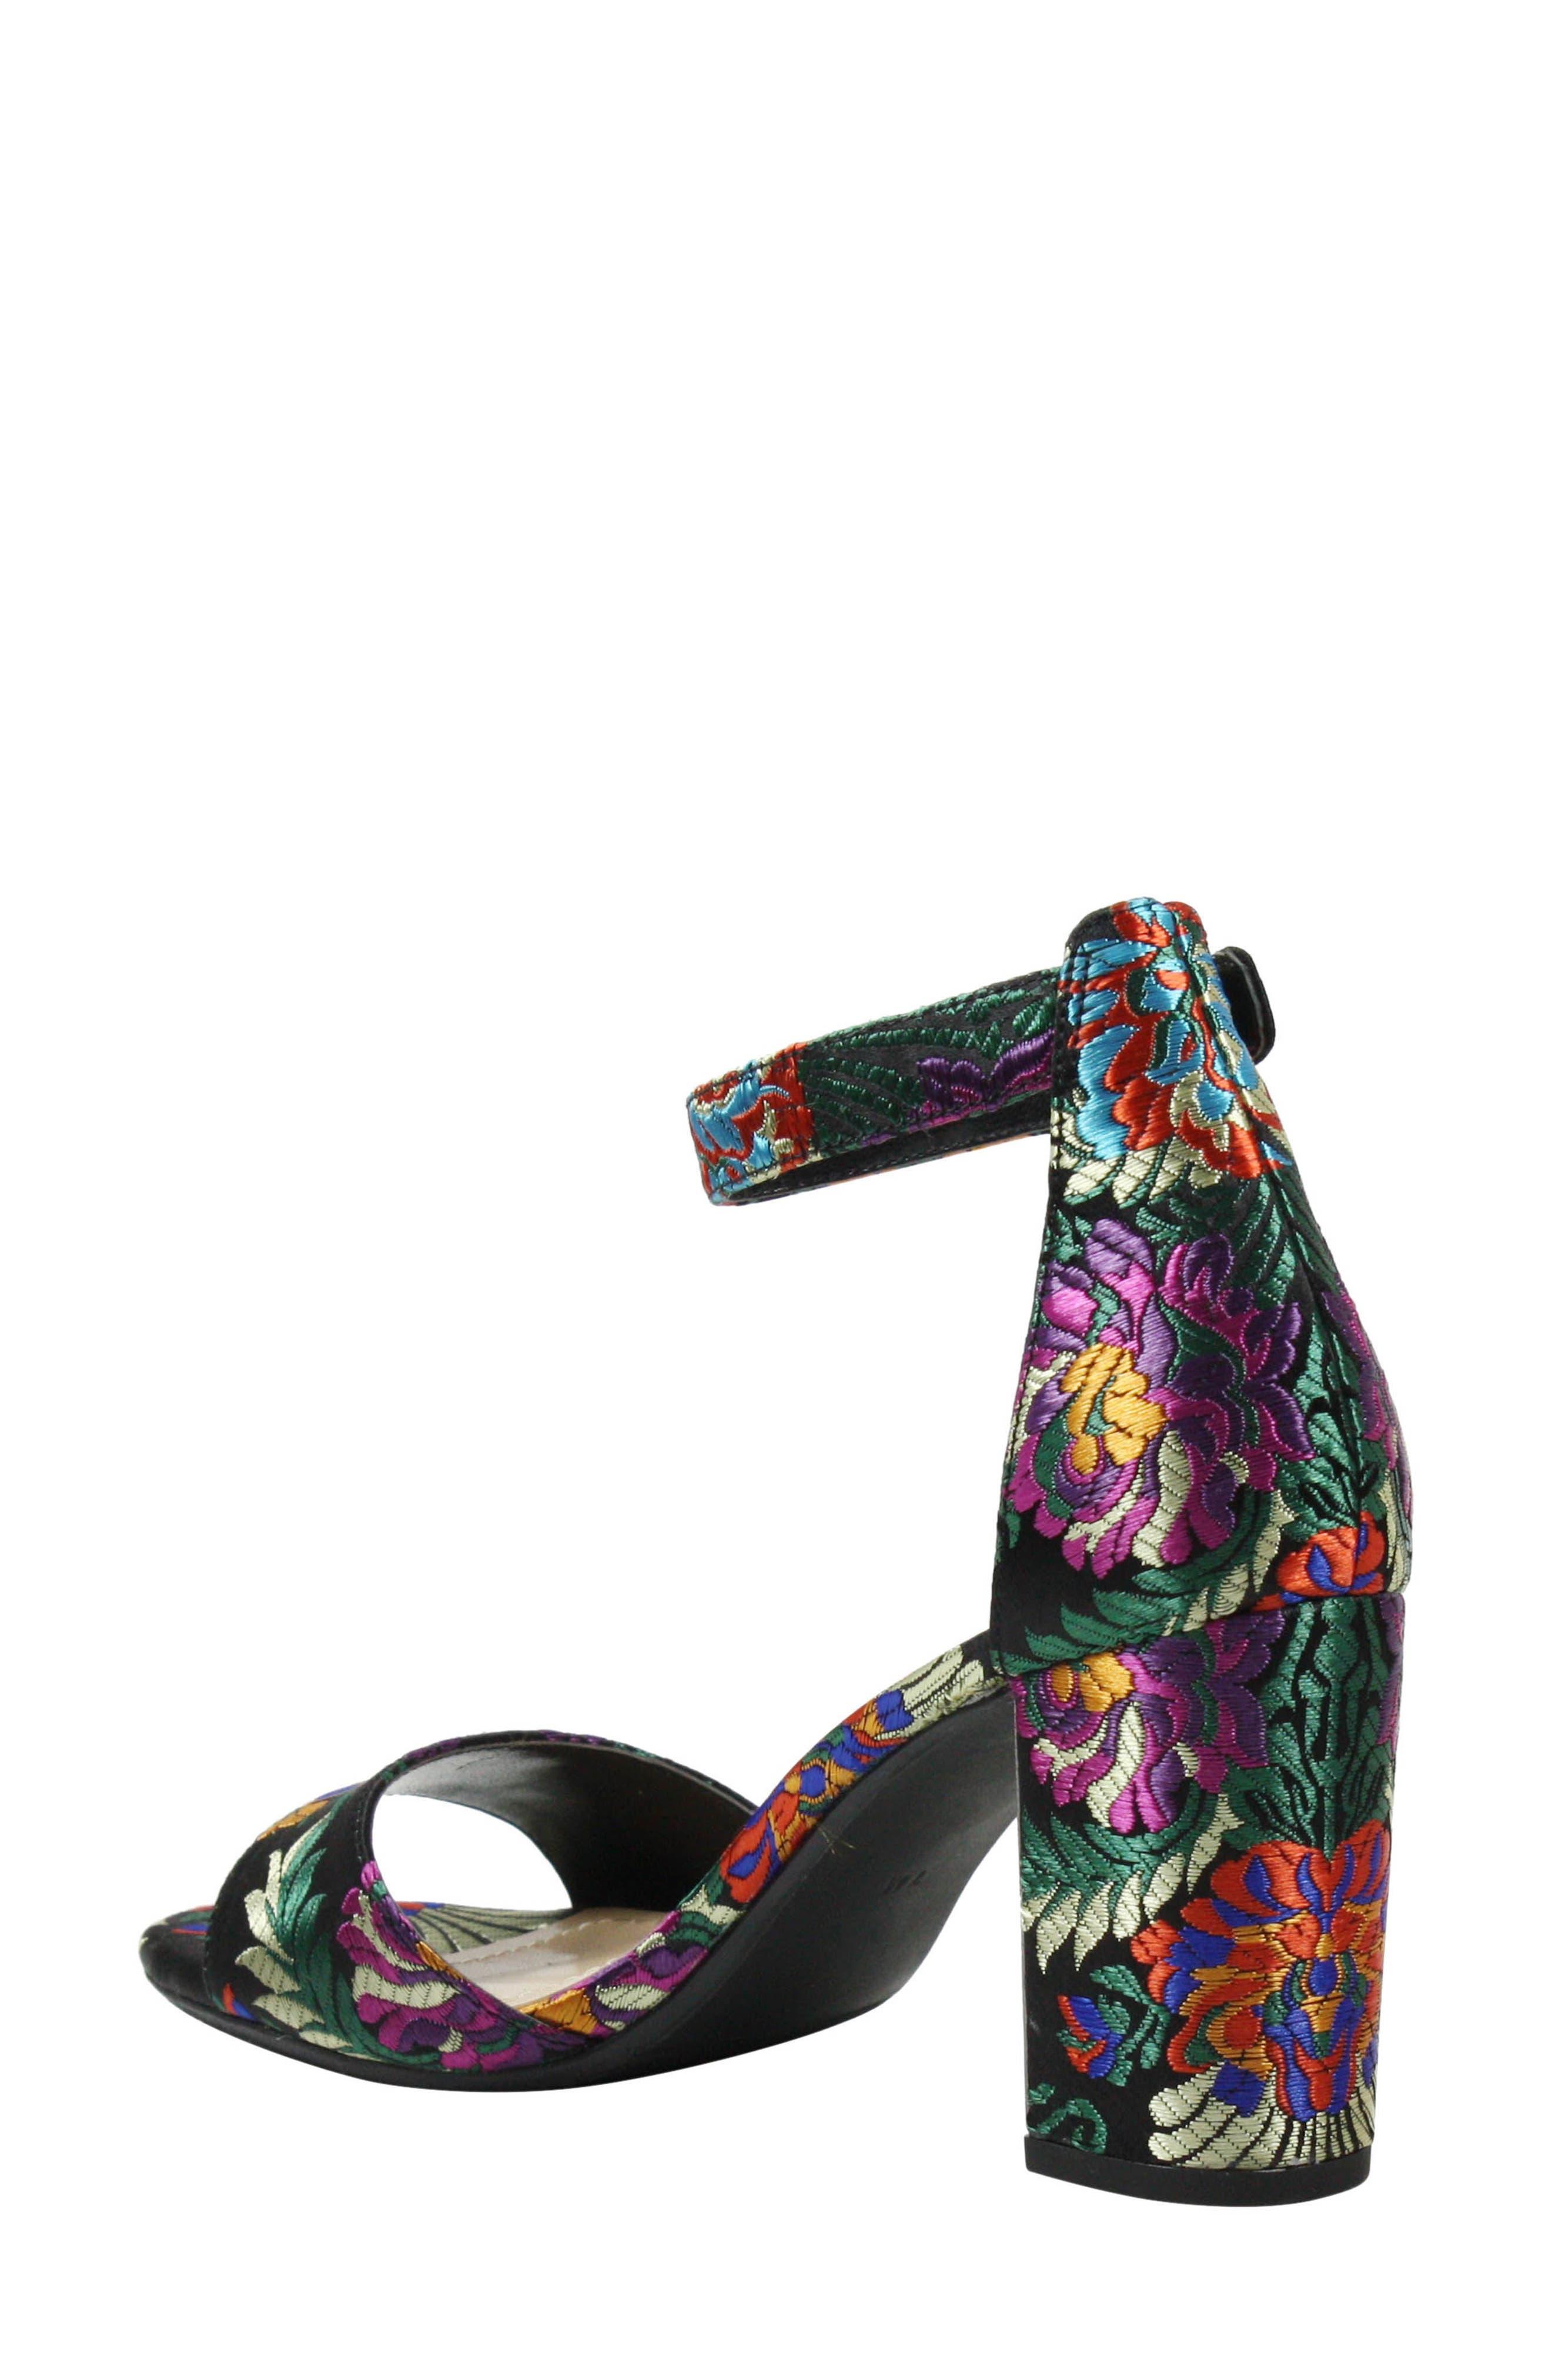 Flaviana Ankle Strap Sandal,                             Alternate thumbnail 2, color,                             BLACK MULTI FABRIC